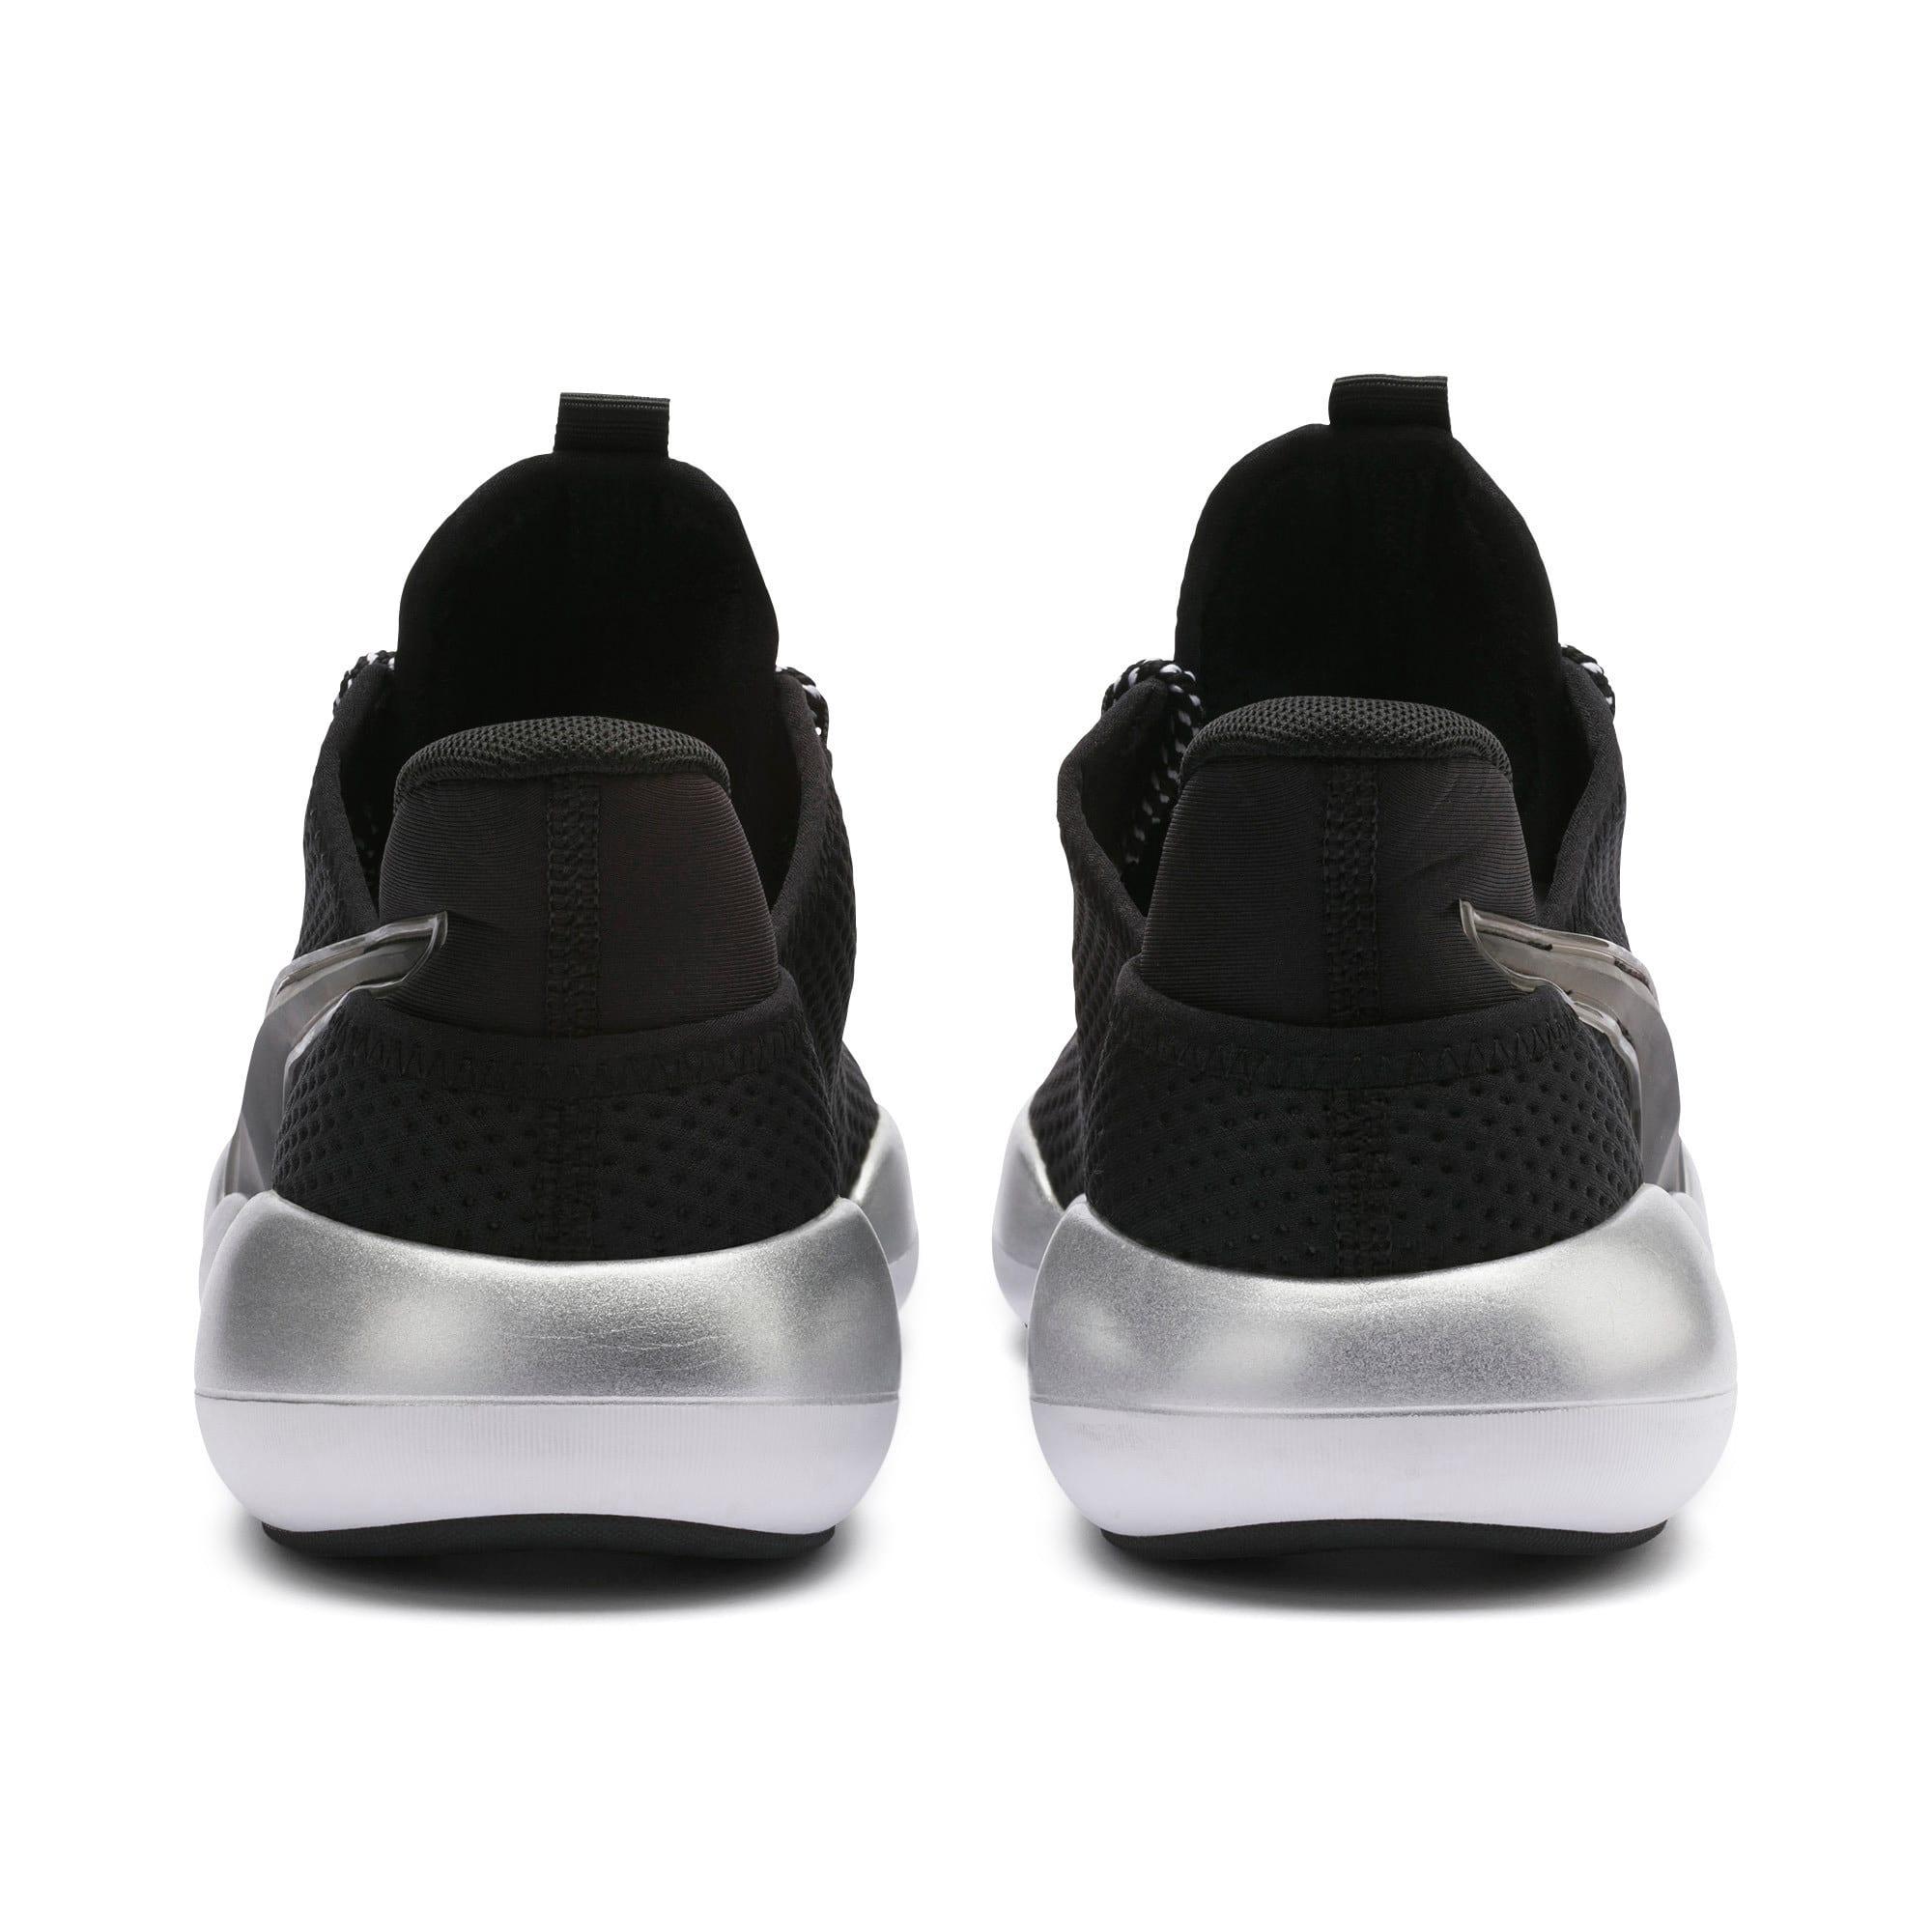 Thumbnail 4 of Mode XT Women's Training Shoes, Puma Black-Puma White, medium